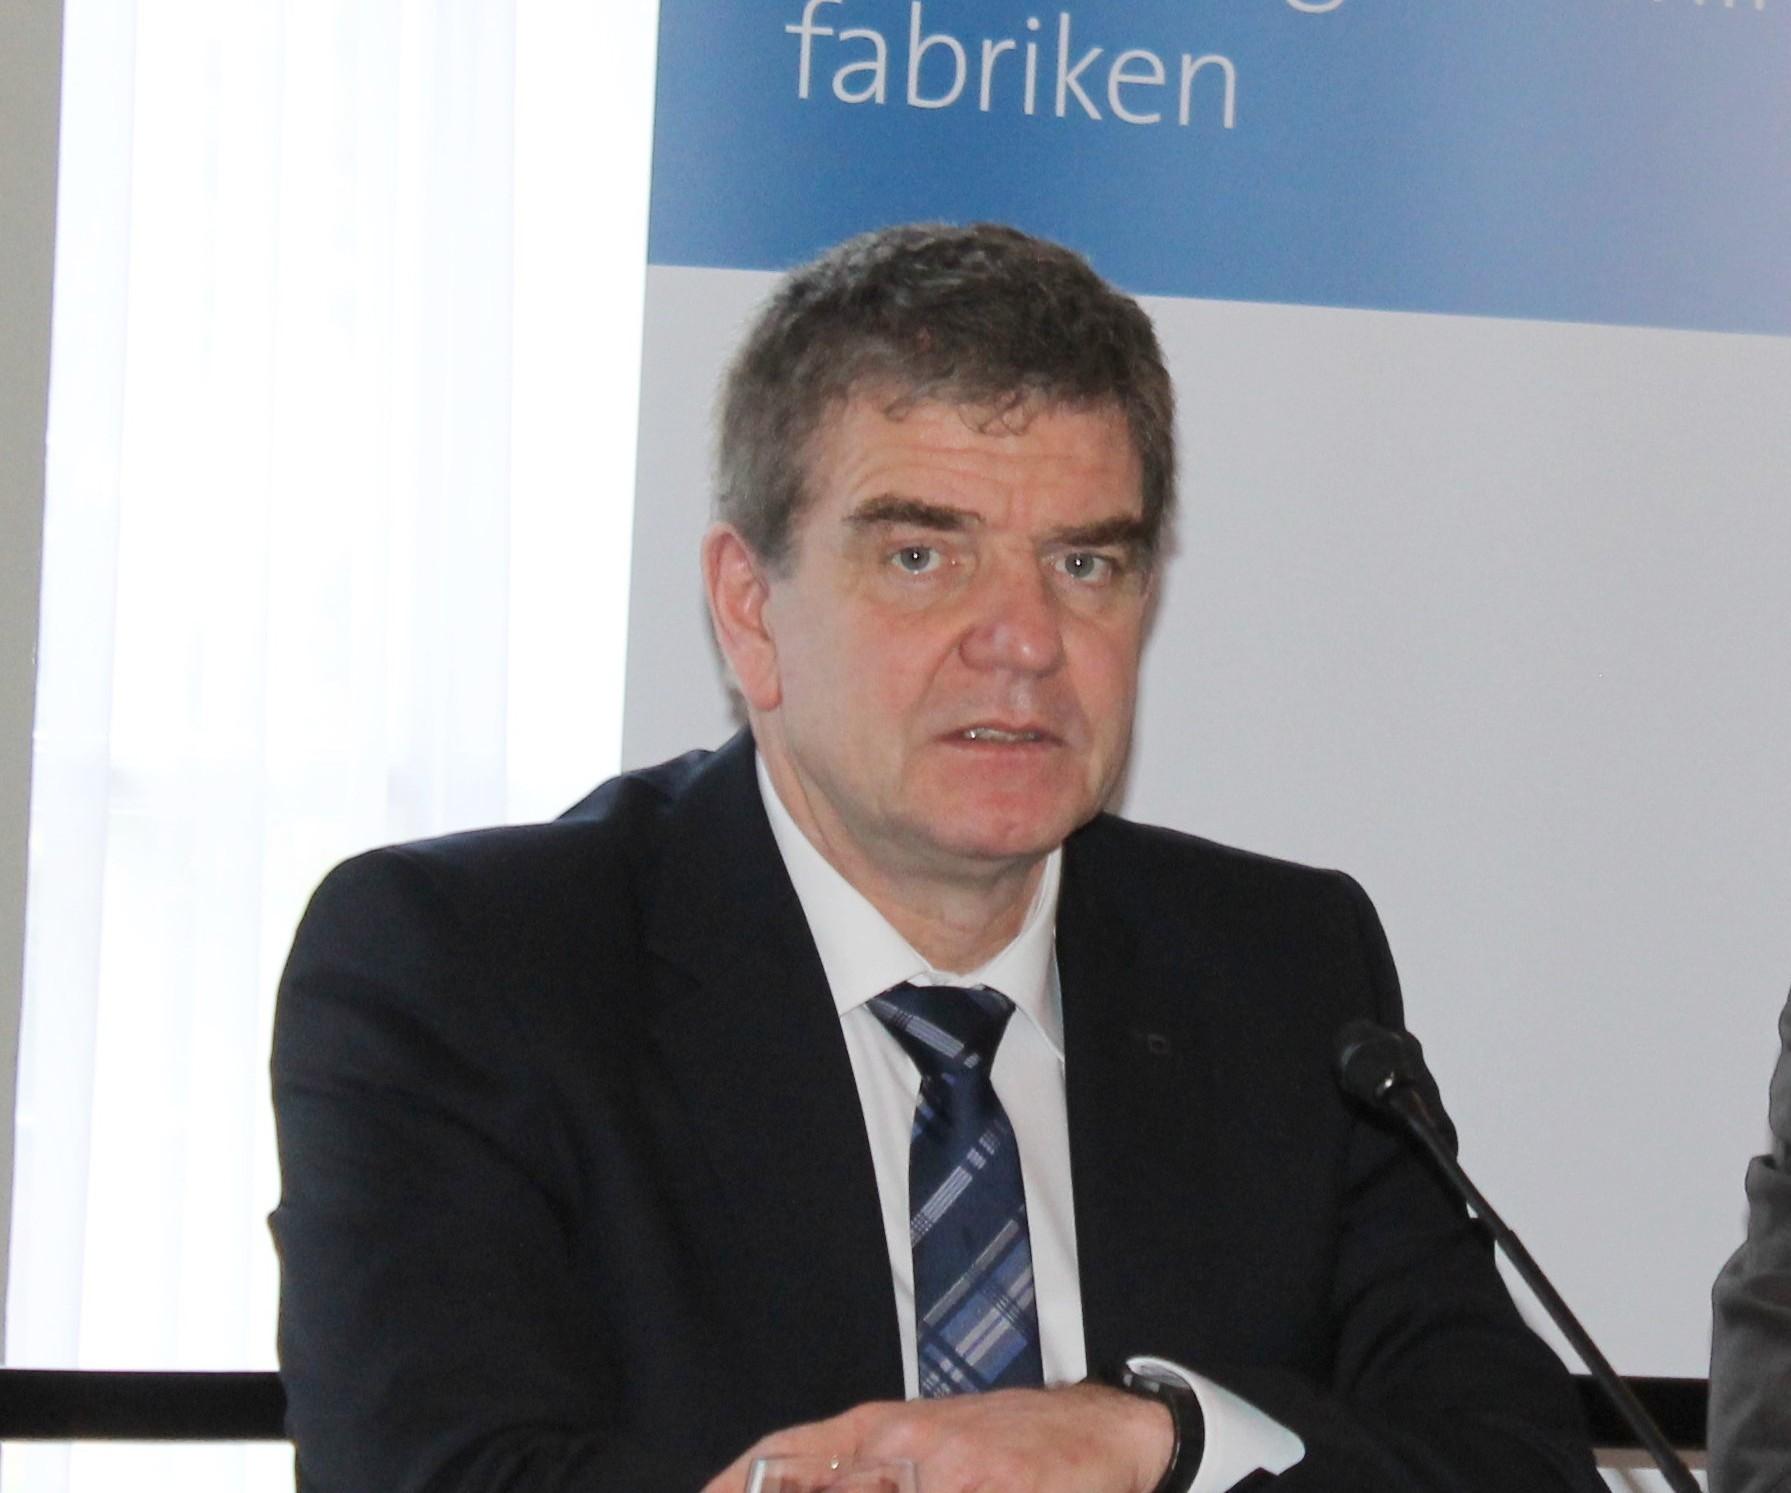 VDW Chairman Heinz-Jürgen Prokop